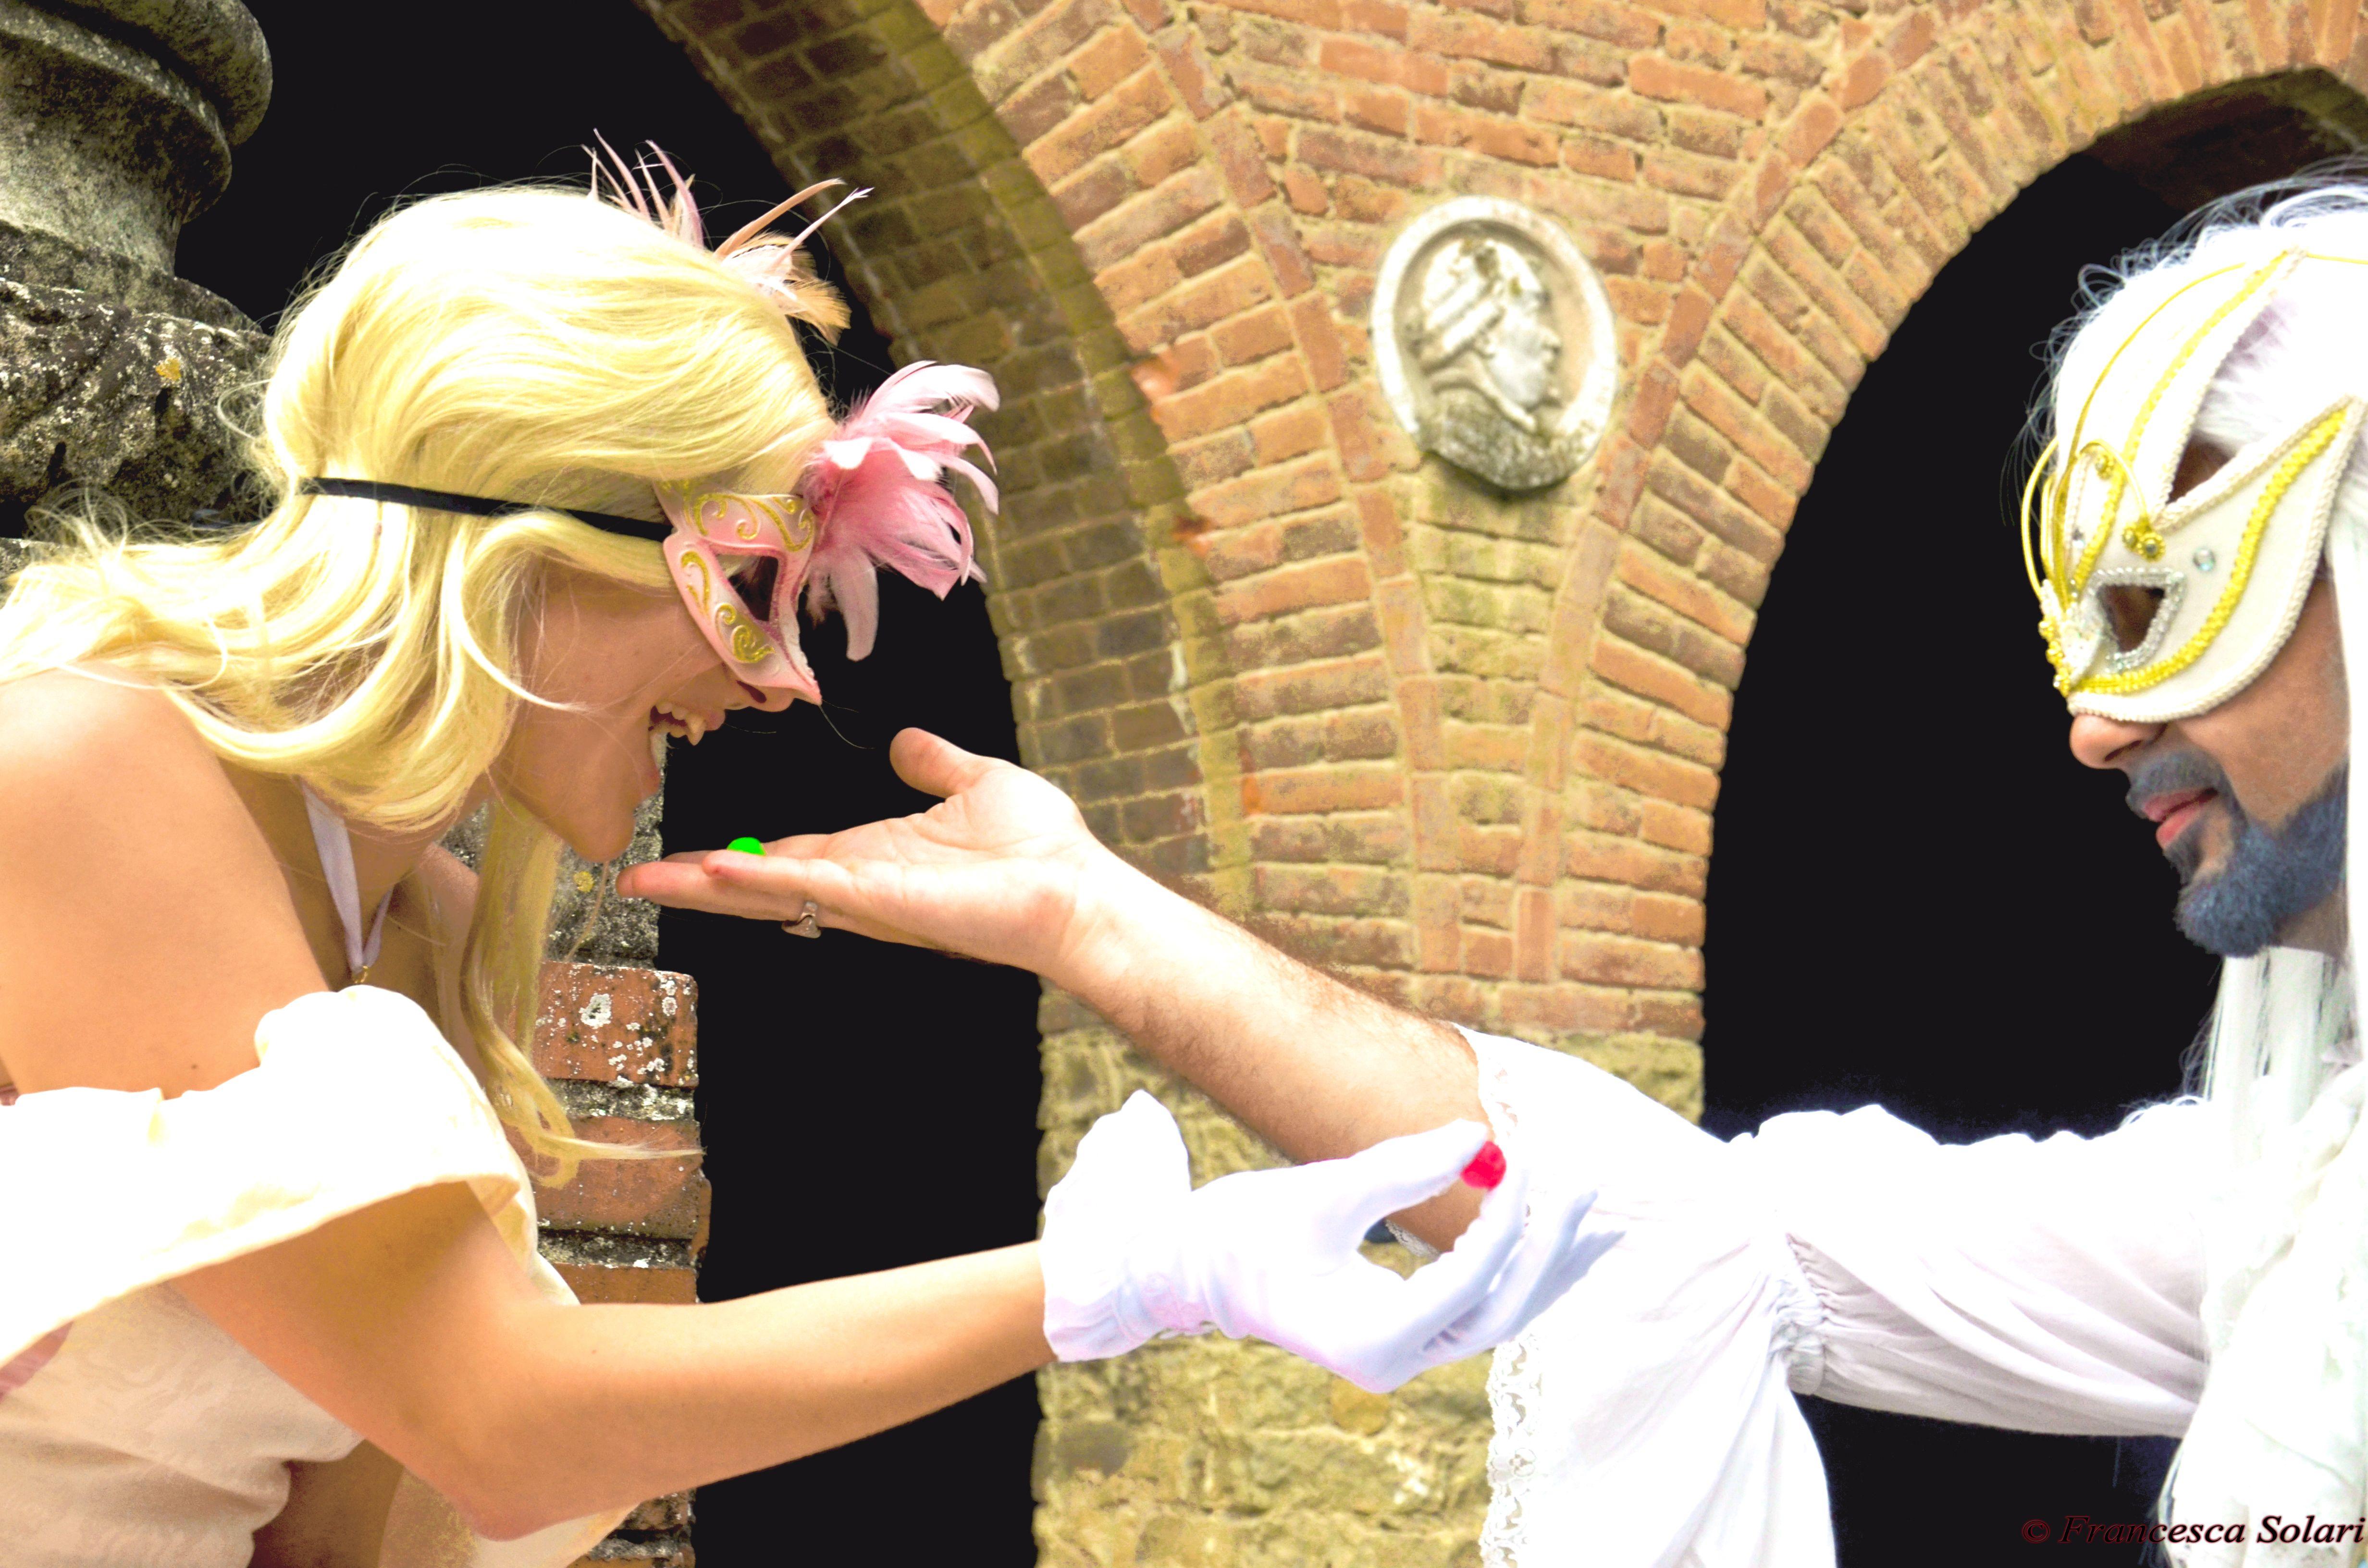 Larien and Weerbloom from Leodhrae http://www.aurorafilippi.com/  Photo by: Francesca Solari https://www.facebook.com/Francesca-Solari-Photography-454269394624161/ Location: Grazzano Visconti (Italy) #leodhrae #fantasy #costume #cosplay #book #novel #fairyland